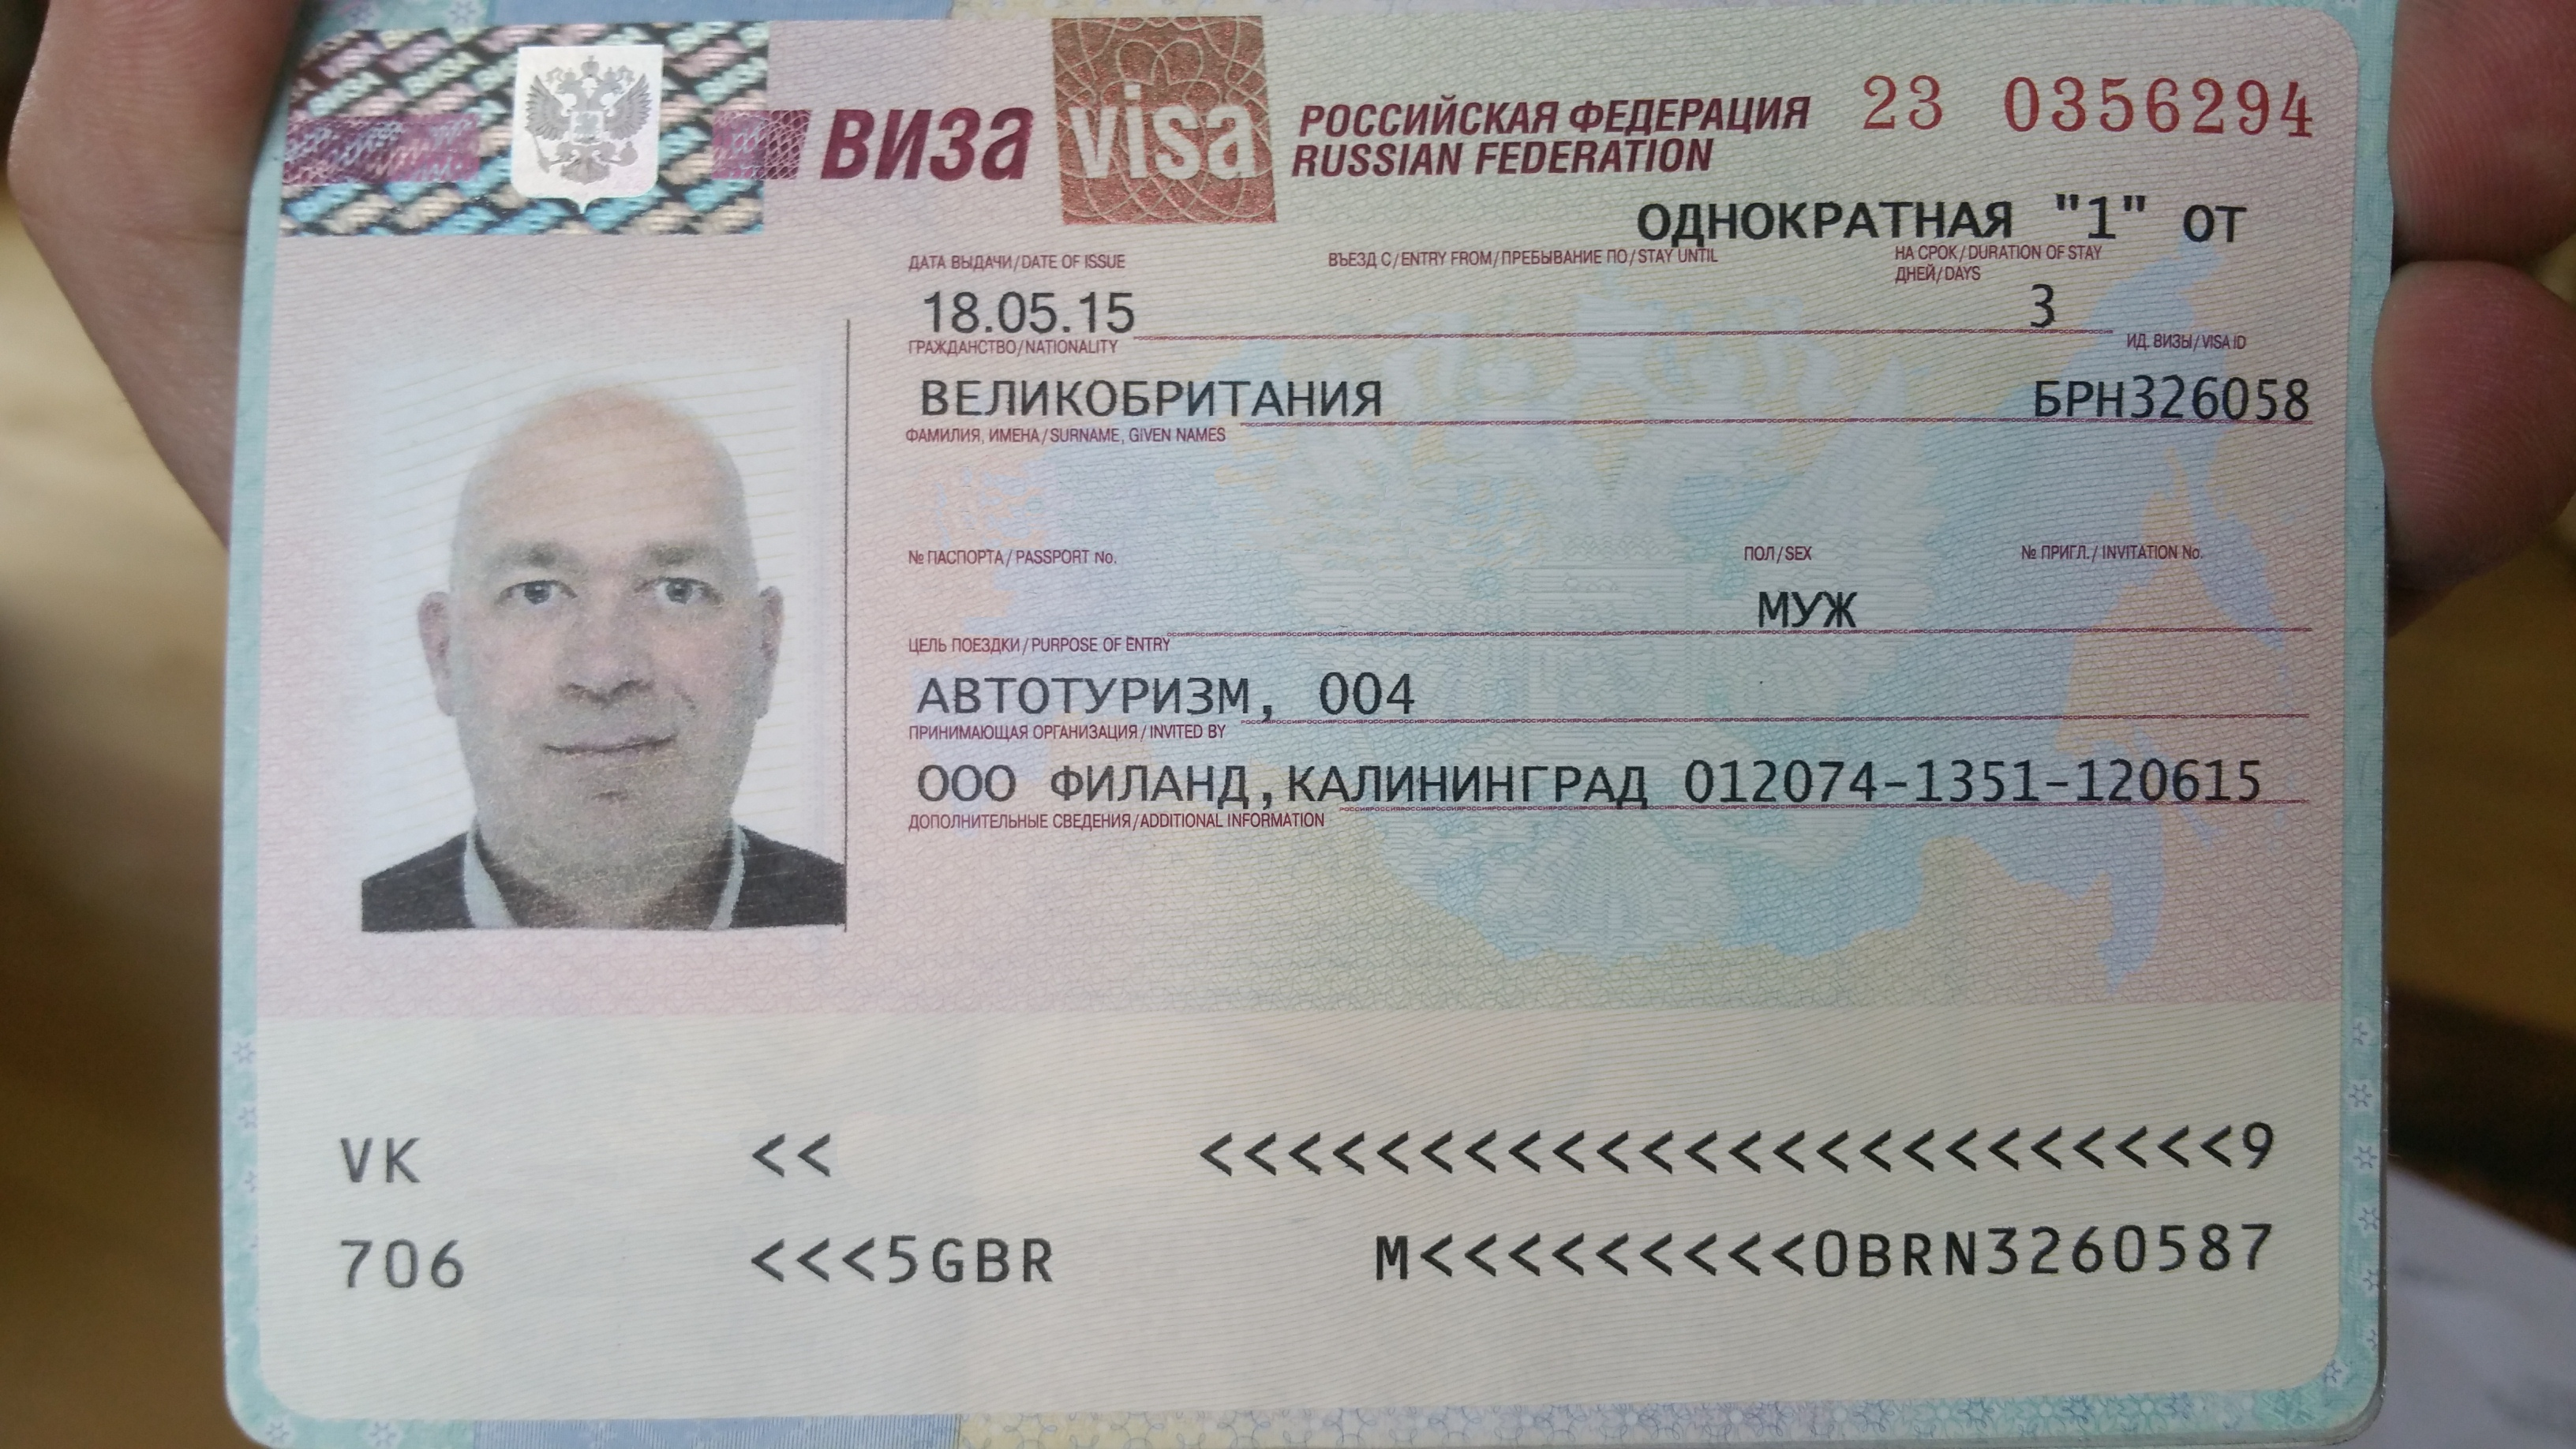 Tdb2015 t 17 hello russia good news again twike 560s adventures altavistaventures Choice Image